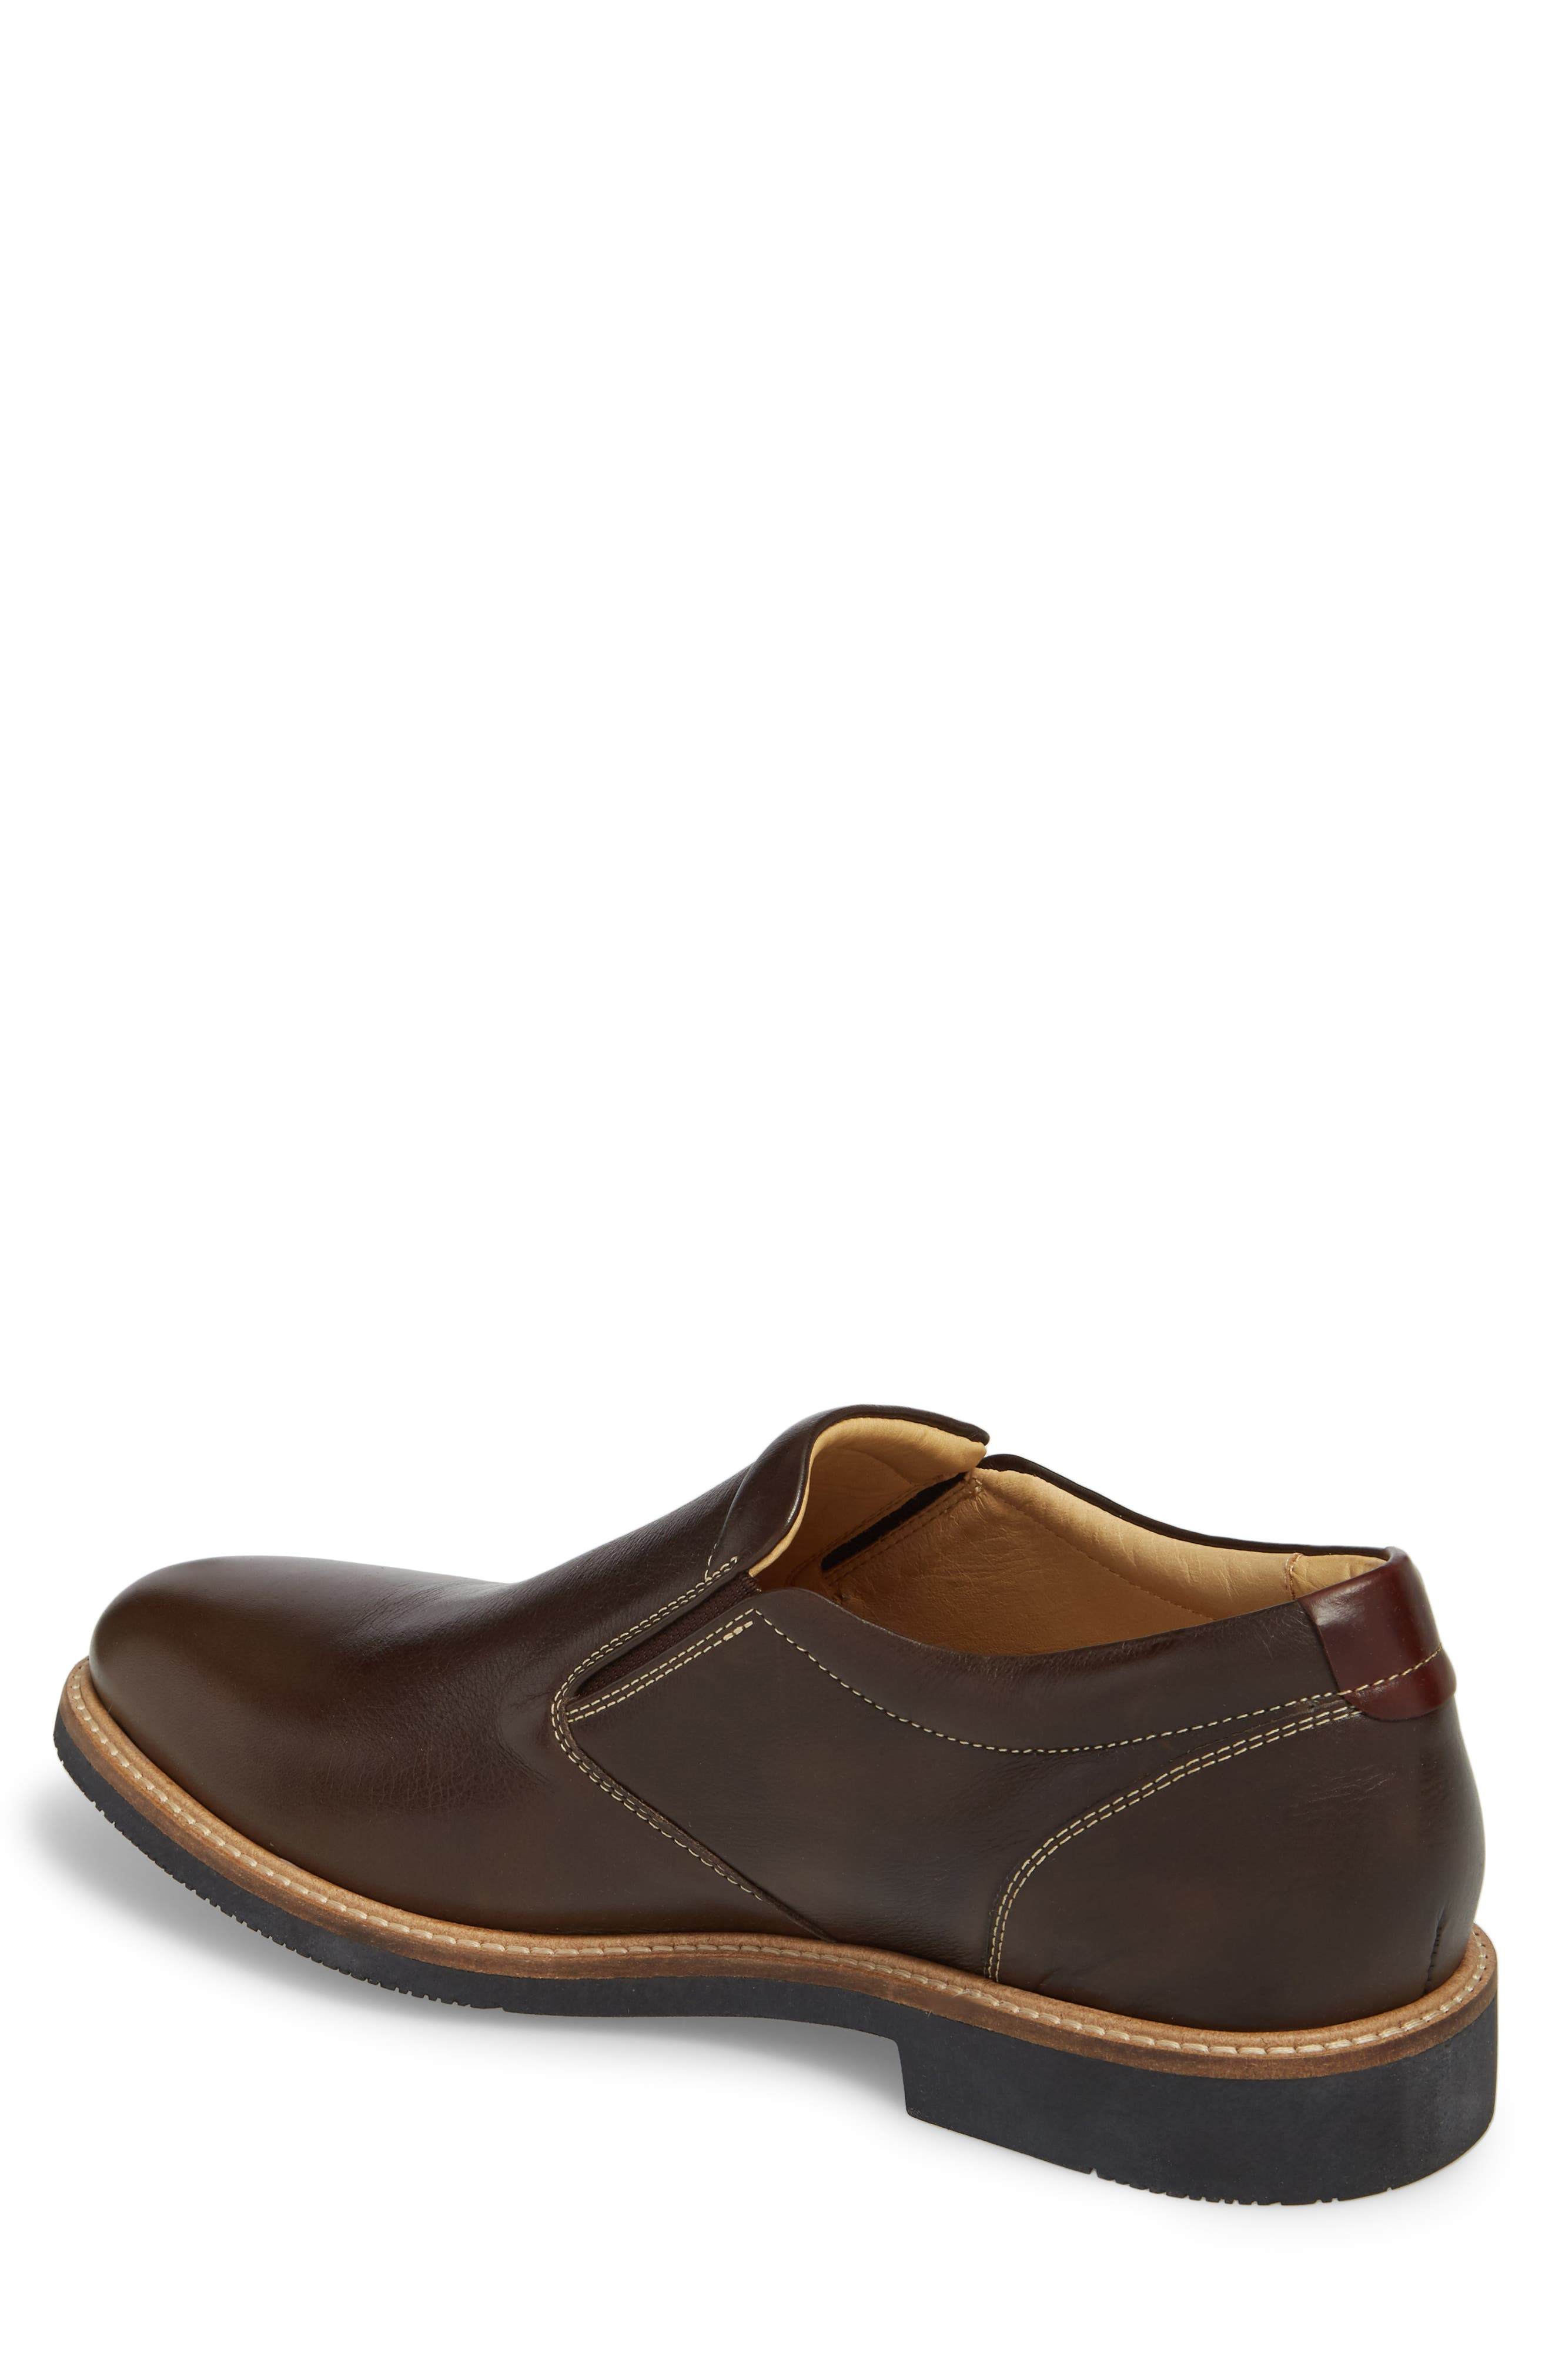 Barlow Plain Toe Slip-On,                             Alternate thumbnail 2, color,                             Dark Brown Leather